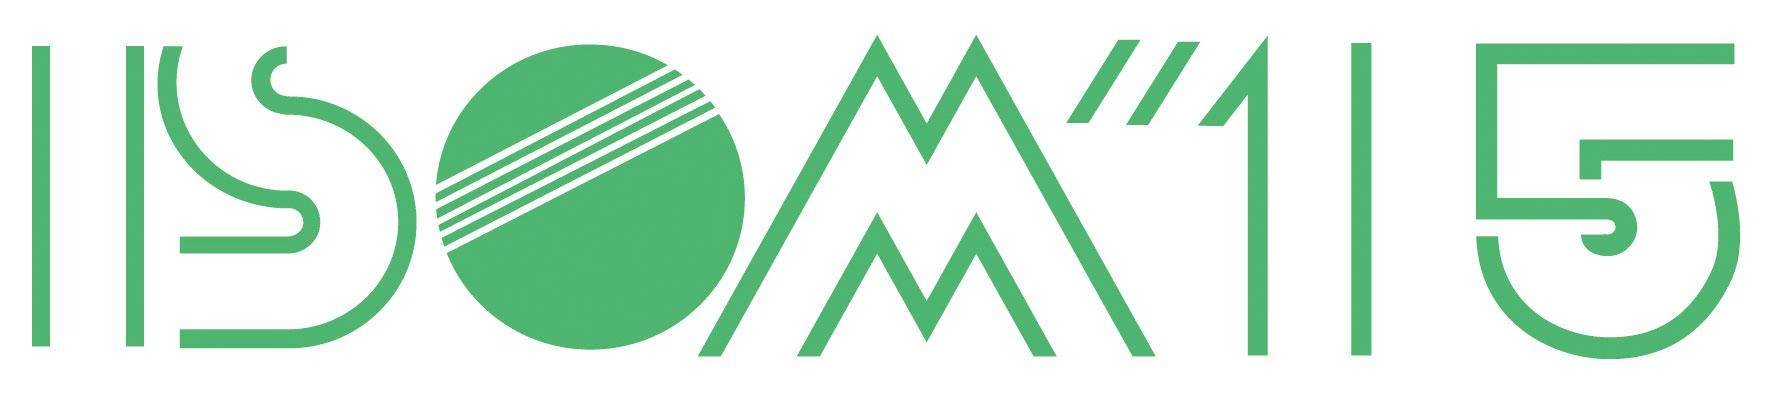 Isom15-logo